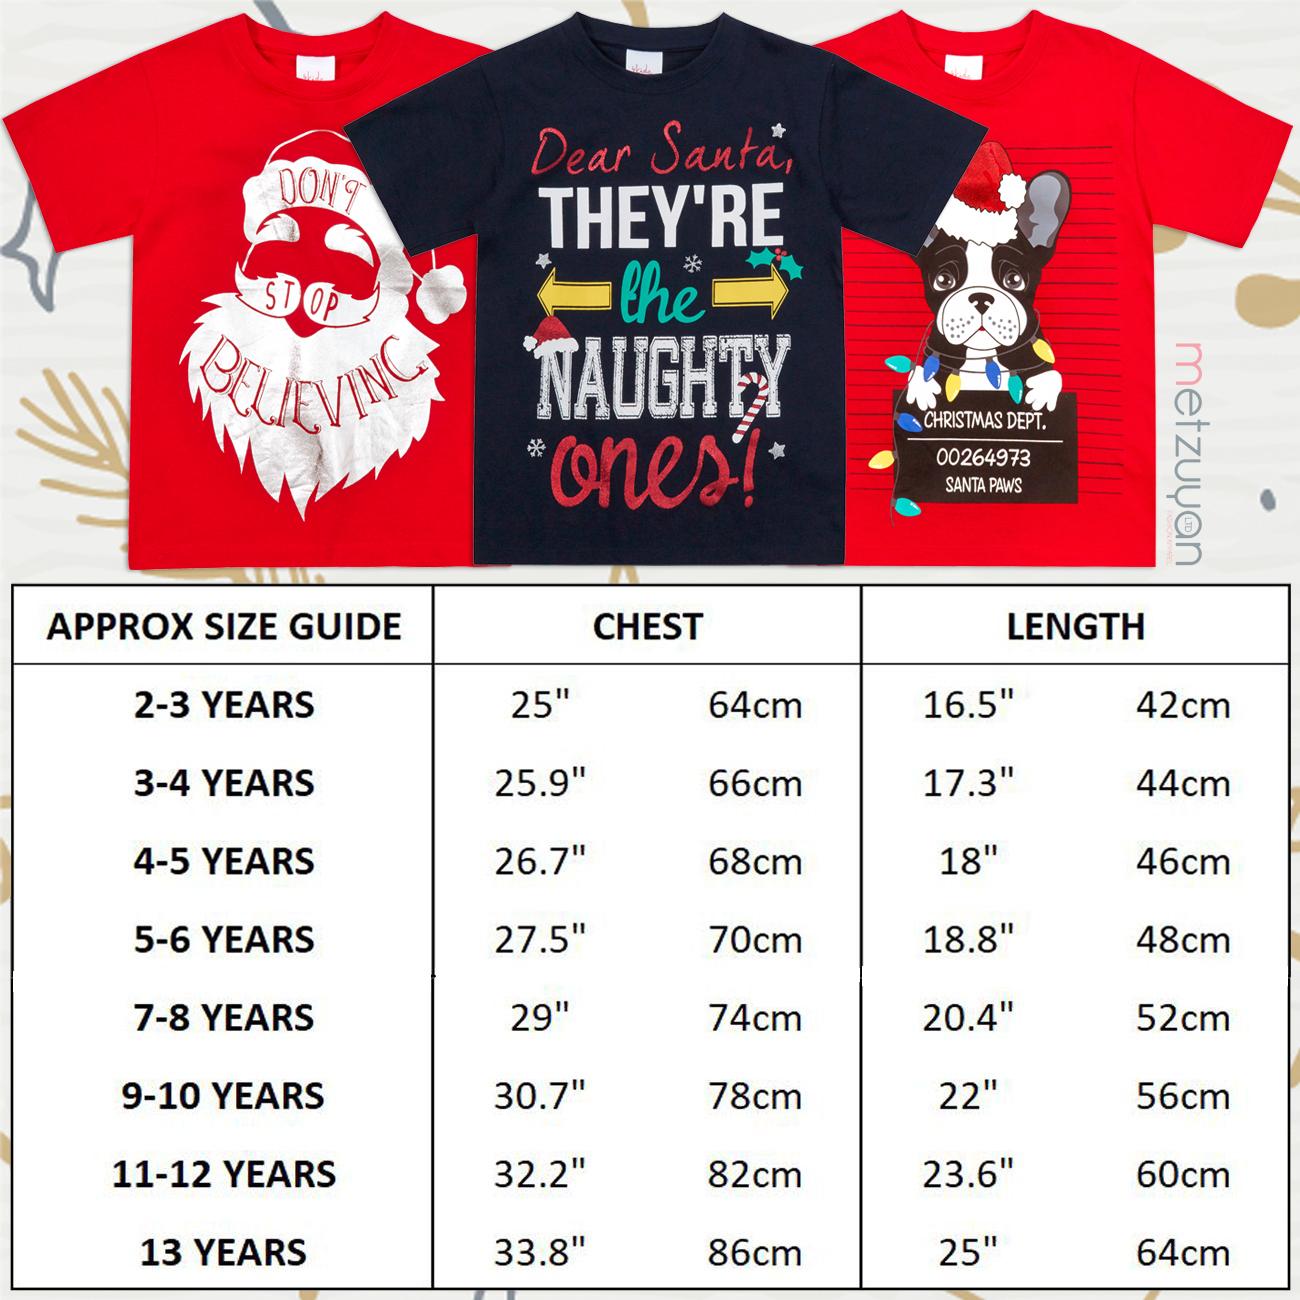 Childrens-Girls-Boys-Xmas-T-Shirts-Printed-Christmas-Design-100-Cotton-2-13-Yrs thumbnail 11